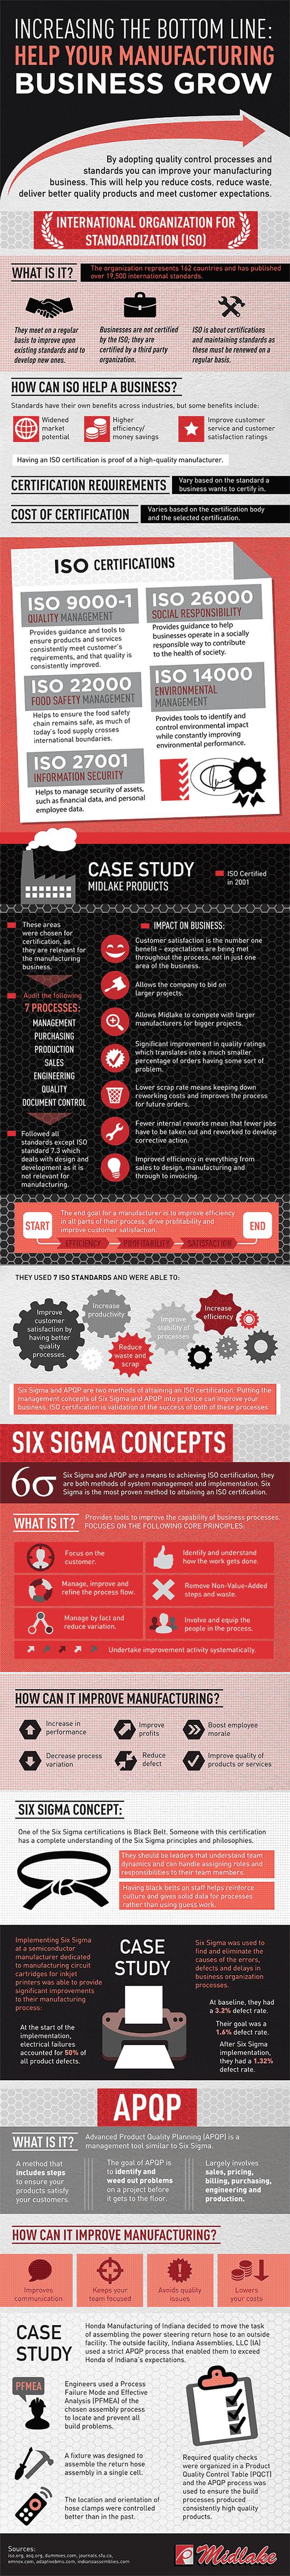 ISO 9001 & Six Sigma Infographic